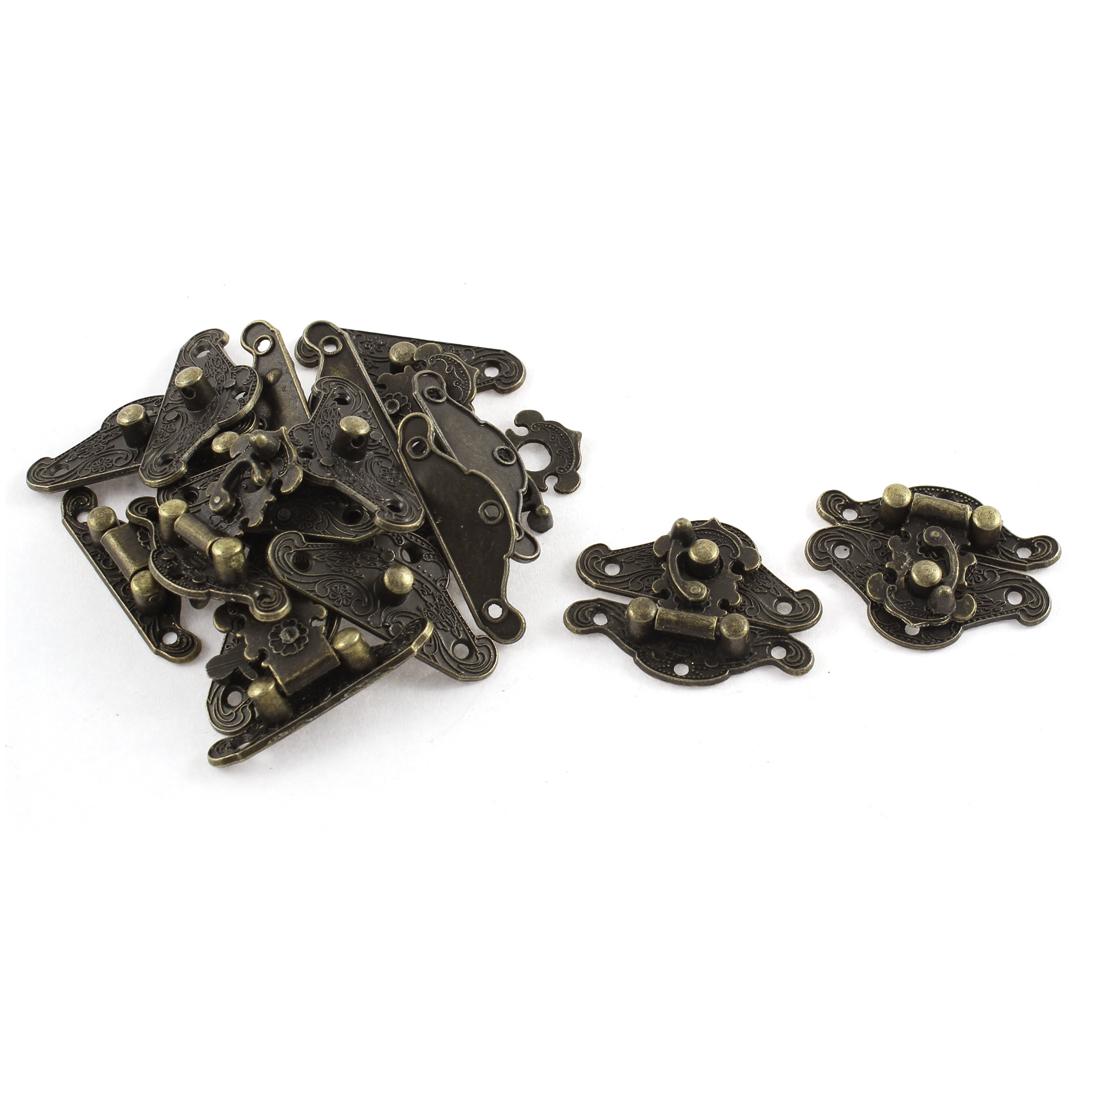 10pcs 37mmx27mm Retro Style Bronze Tone Box Cabinet Hook Lock Lid Latch